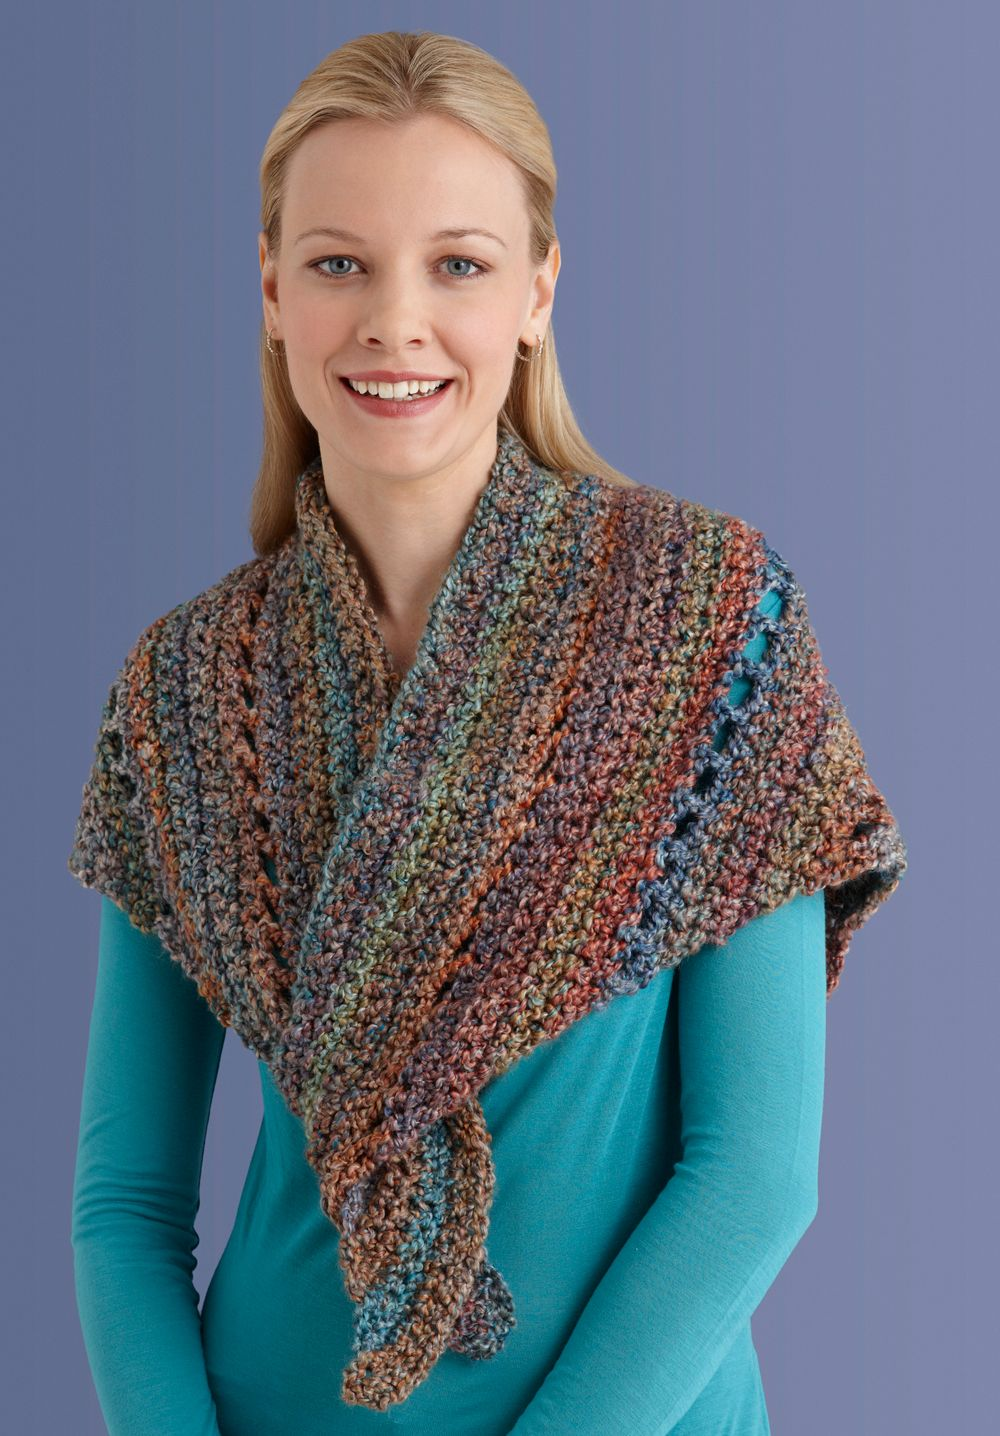 Beginnercrochetshawltriangle pattern l20010 crochet beginnercrochetshawltriangle pattern l20010 bankloansurffo Choice Image